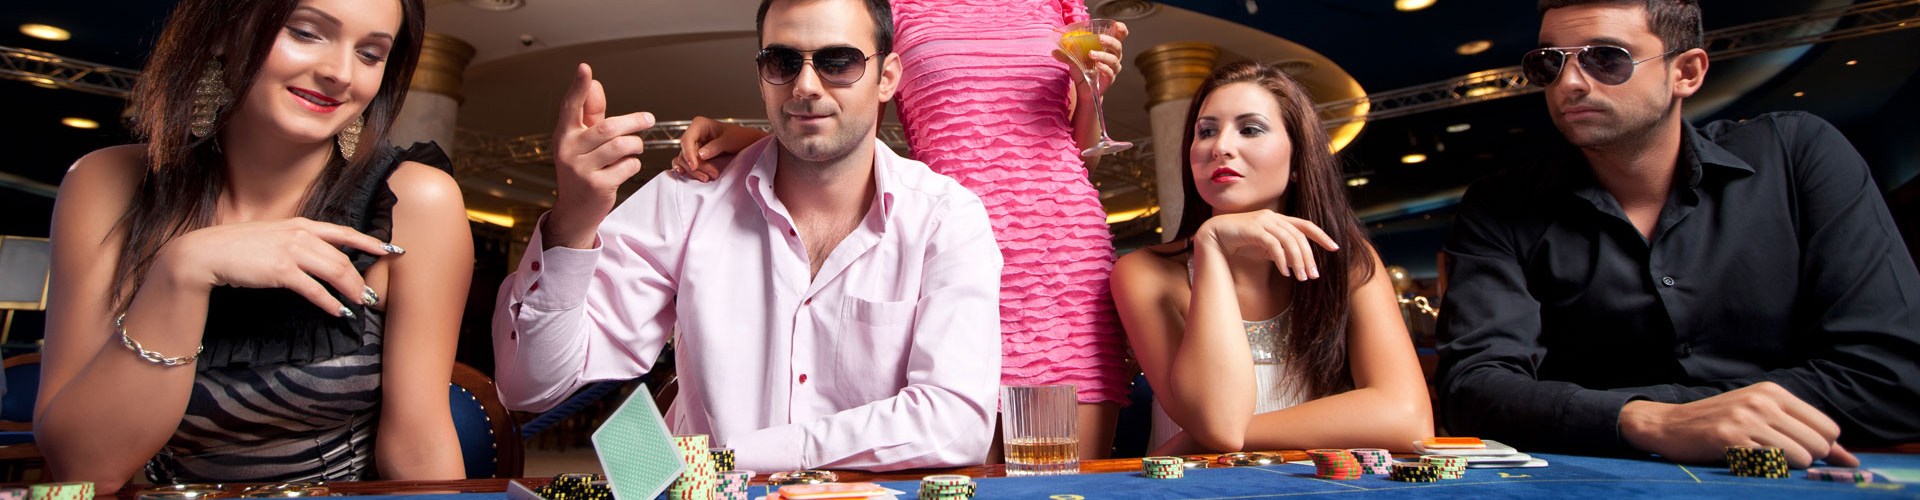 casino party rentals boston, casino night rentals